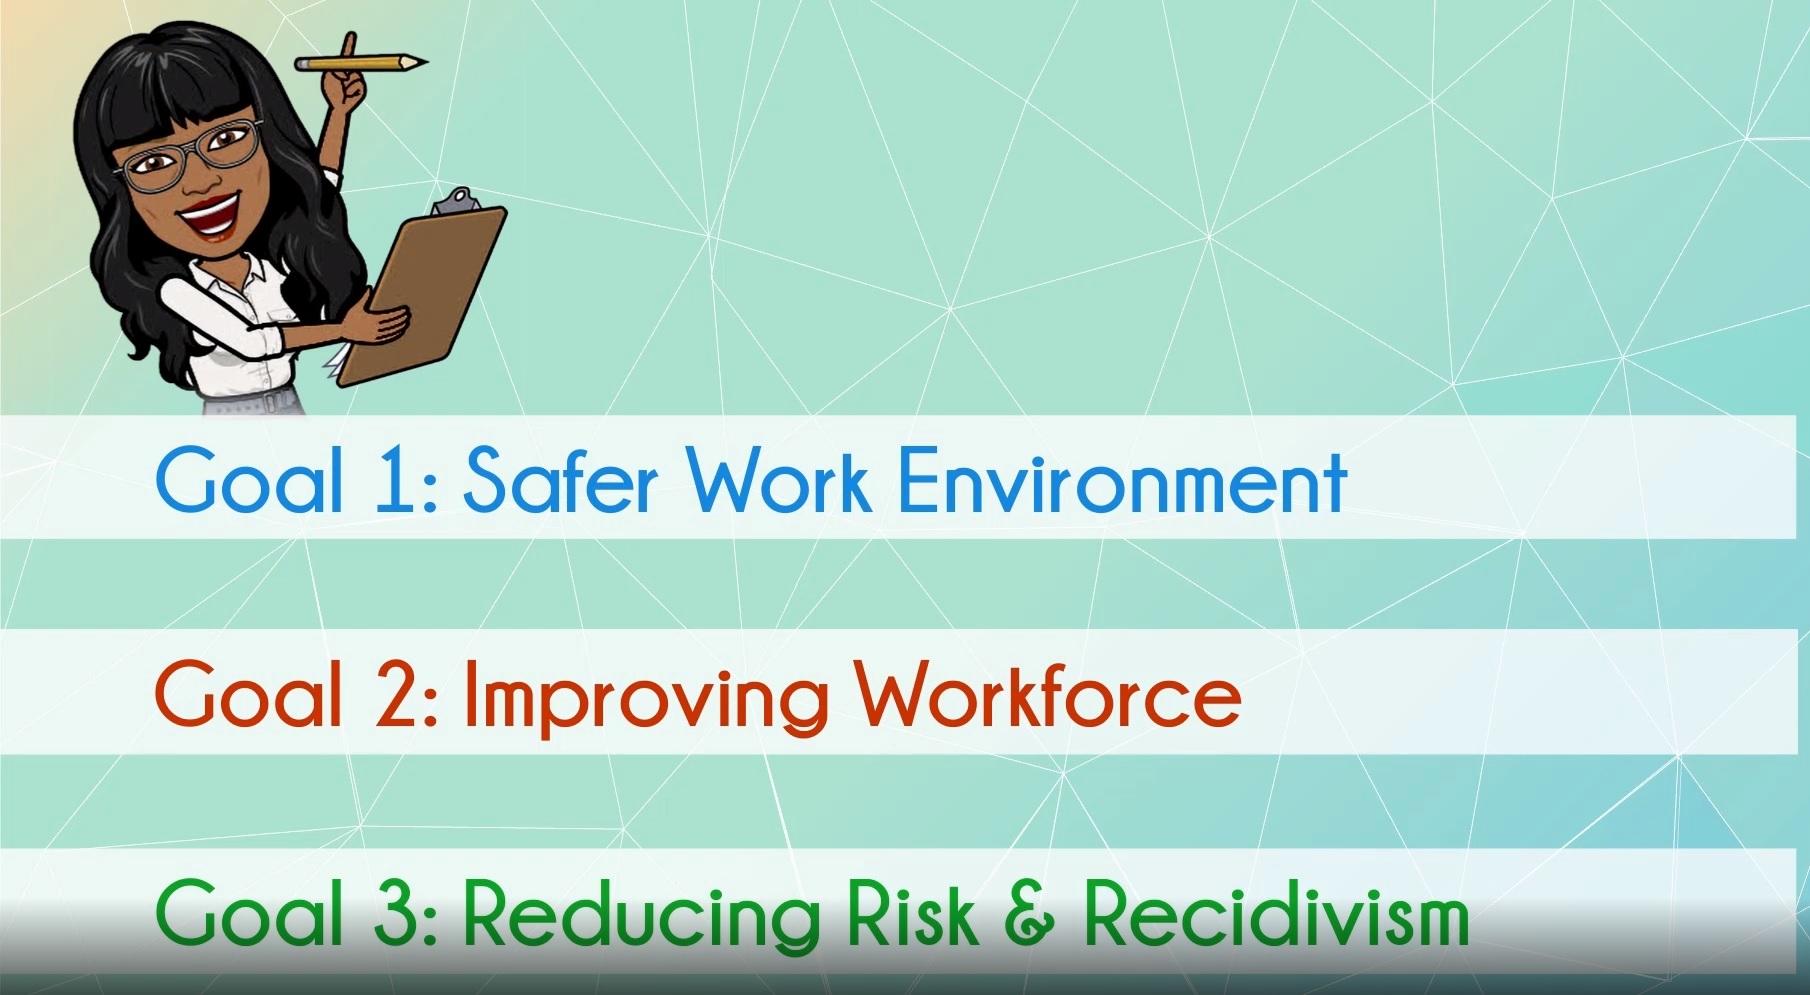 Goal 1: Safer Work Environment, Goal 2: Improving Workforce, Goal 3: Reducing Risk & Recidivism